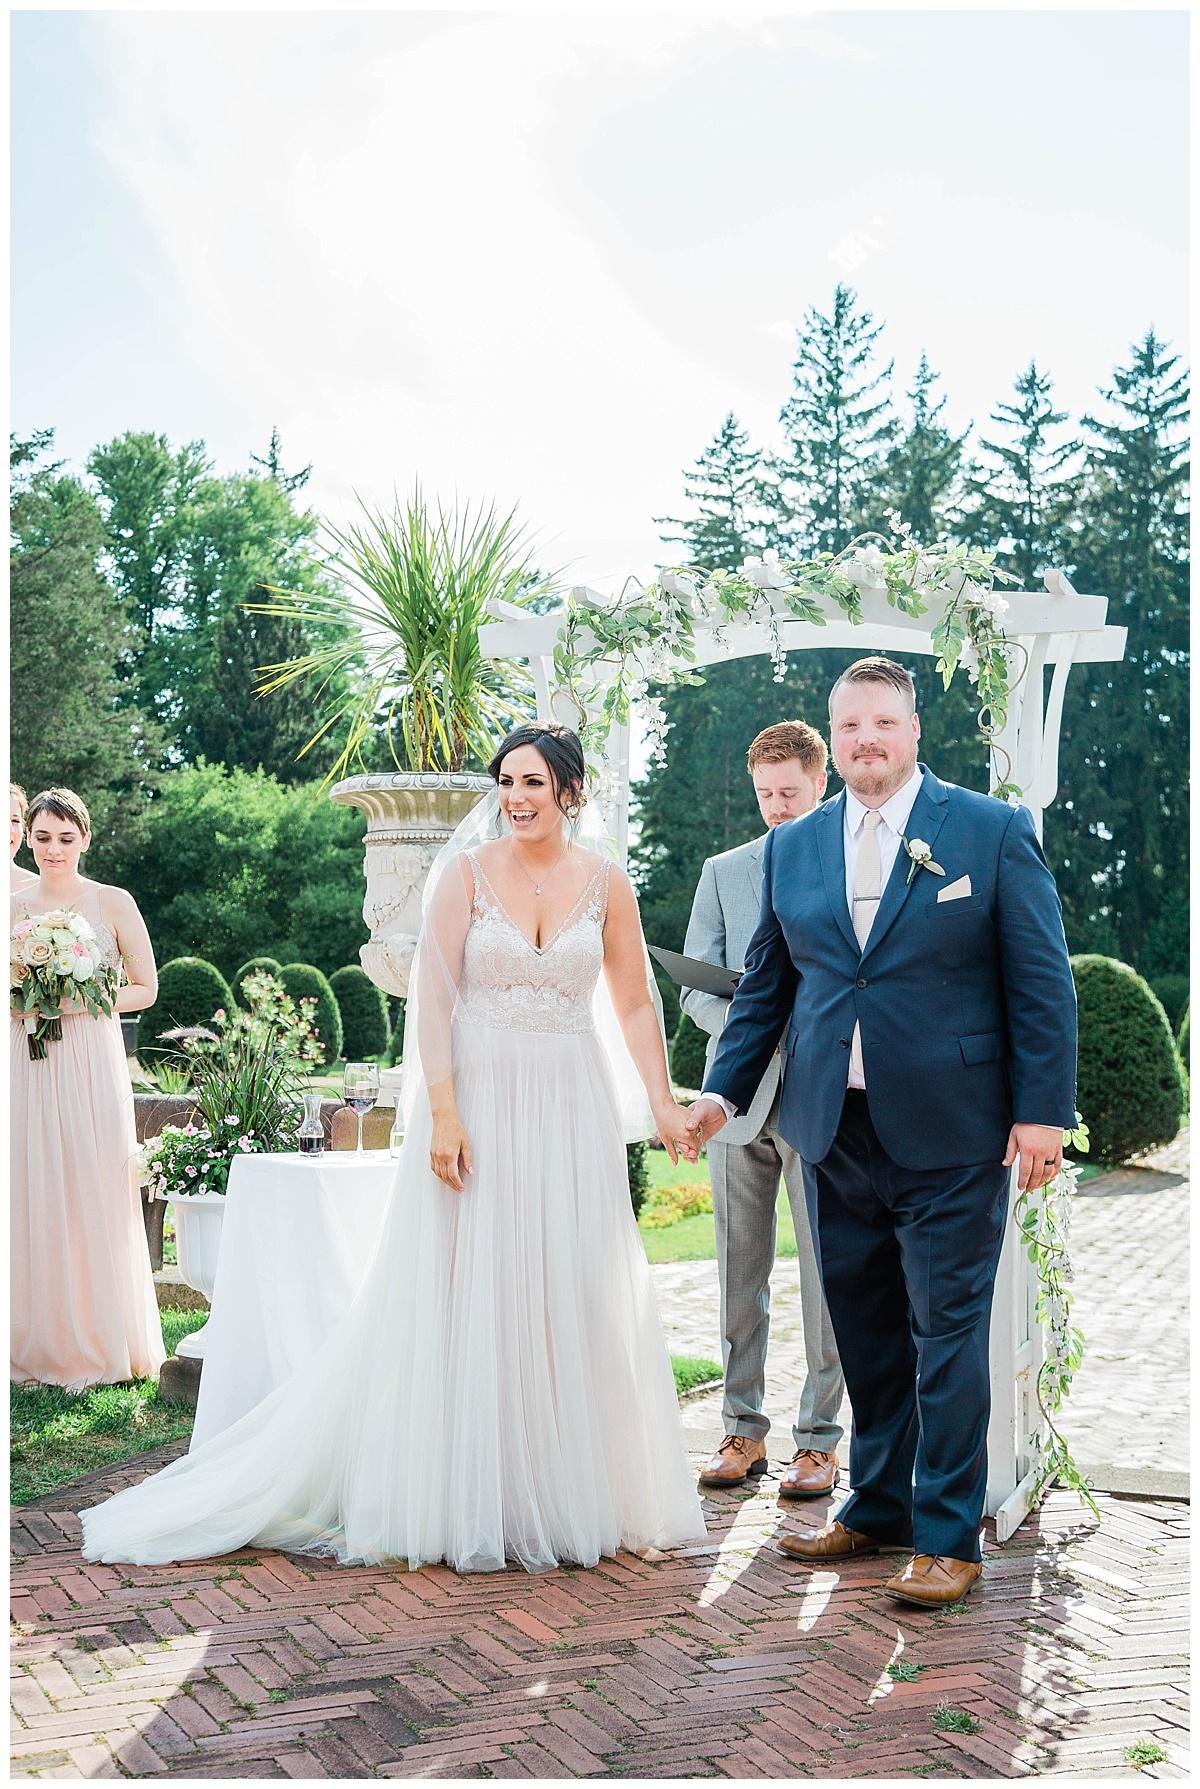 Rachel and Nick - Sonnenberg Gardens Wedding-631.jpg